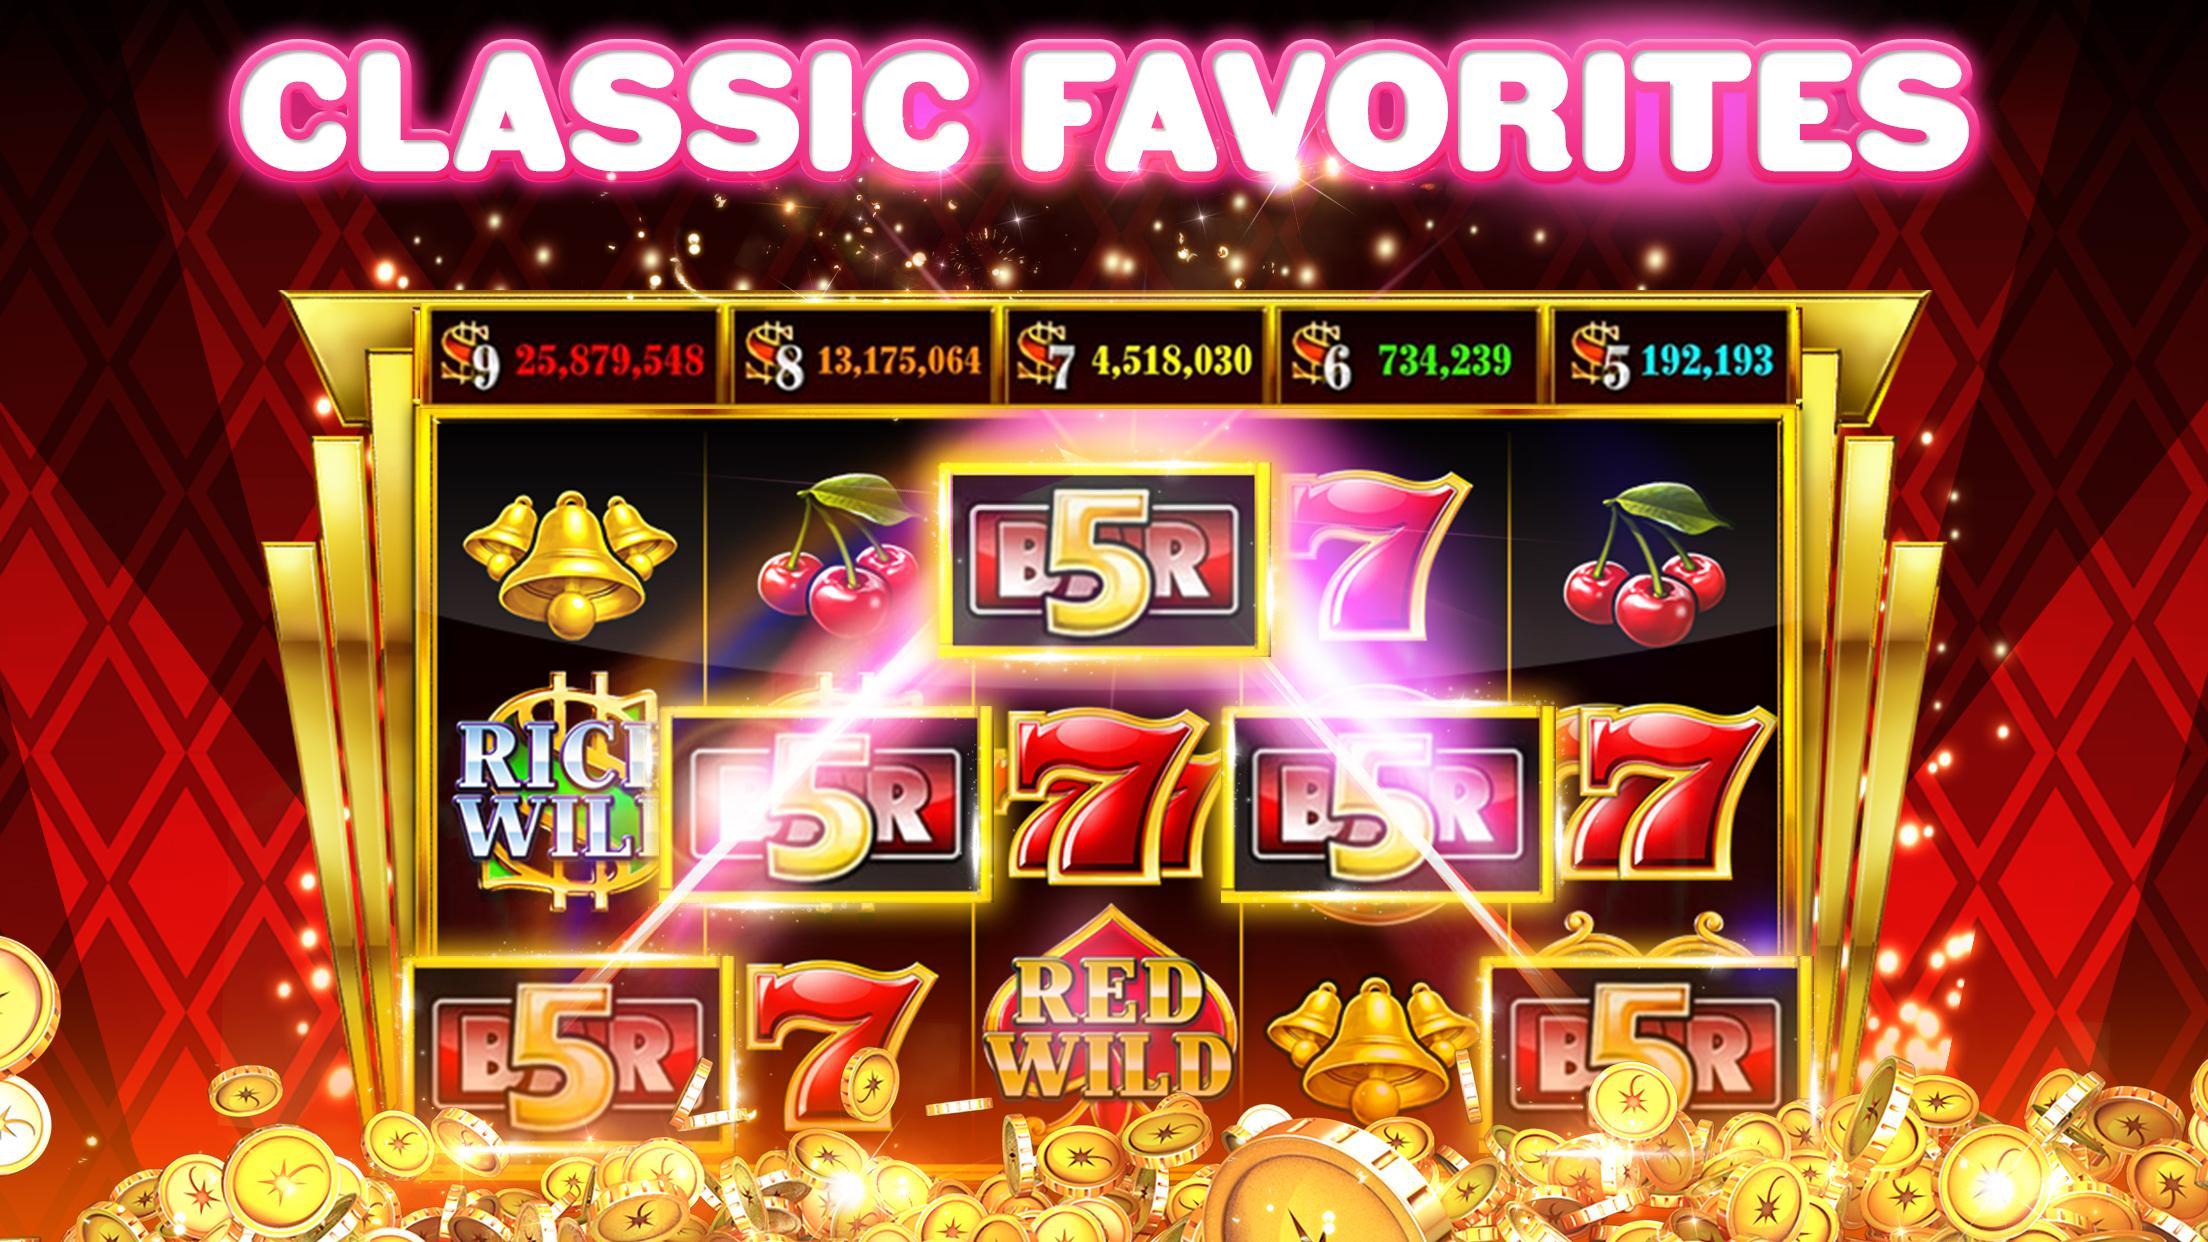 Jackpotjoy Slots Slot machines with Bonus Games 26.0.05 Screenshot 16